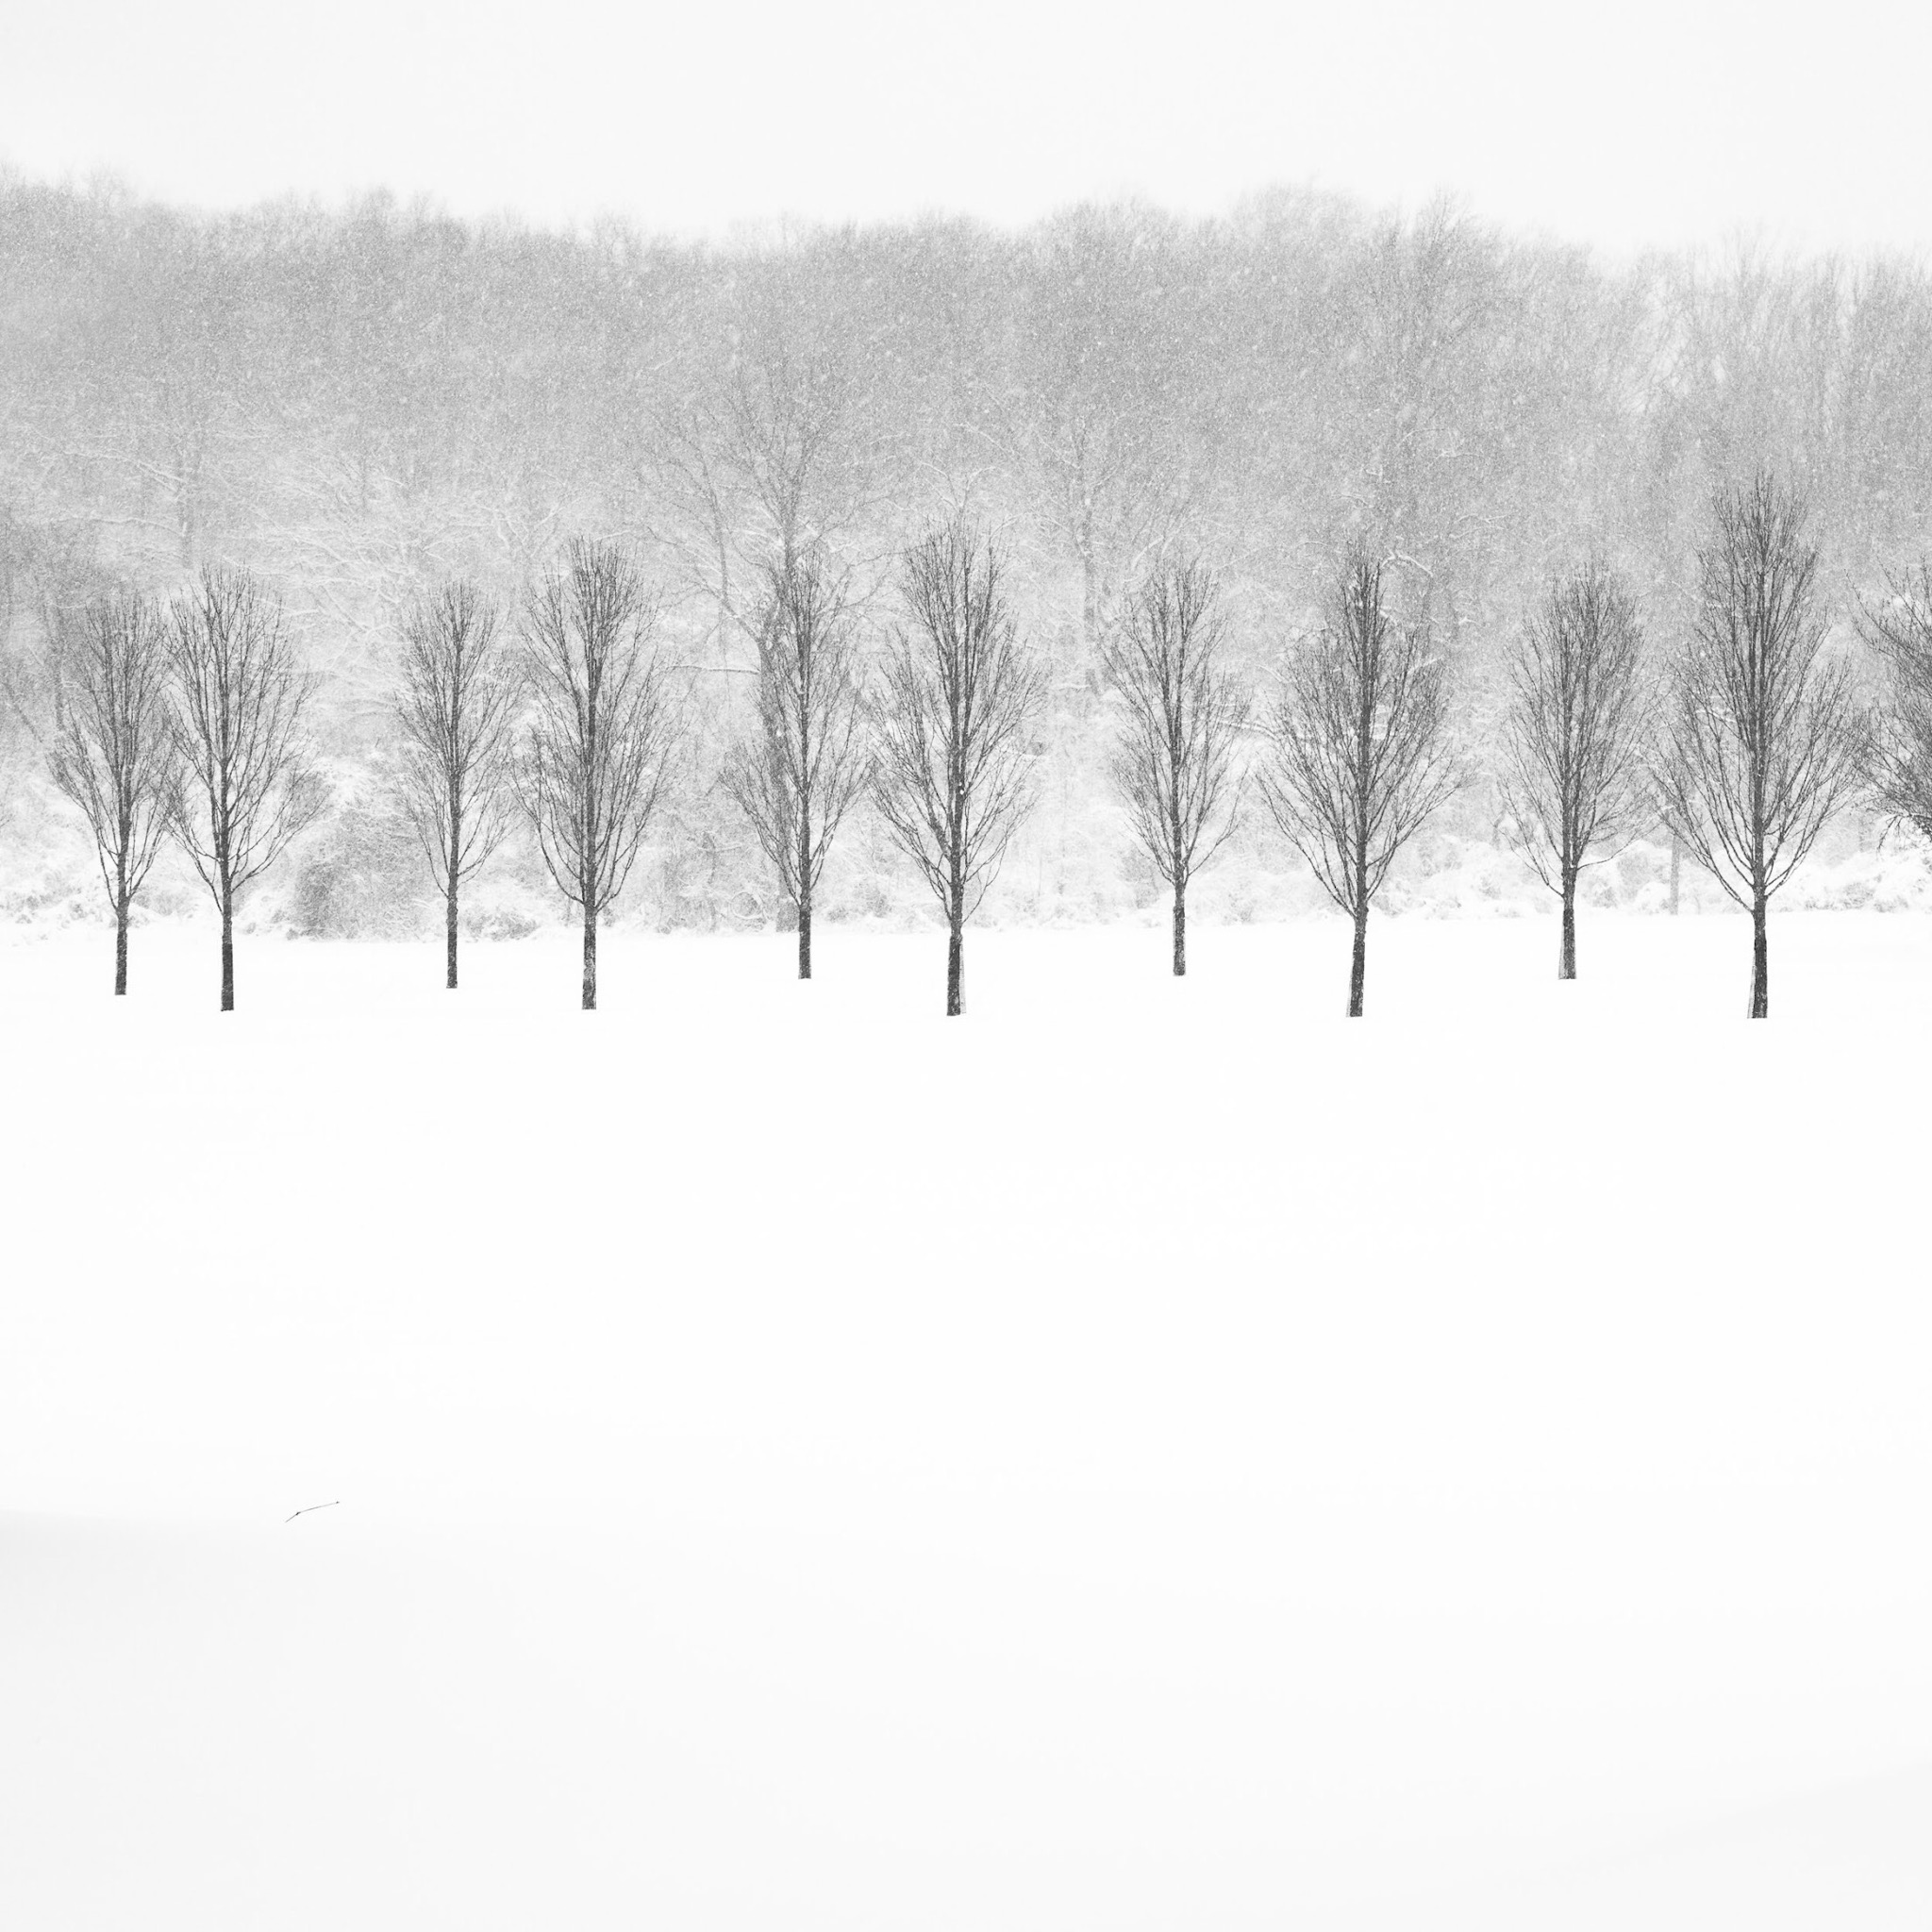 A Row of Trees - ©John Guillaume - f11, 1/125 sec, ISO 160